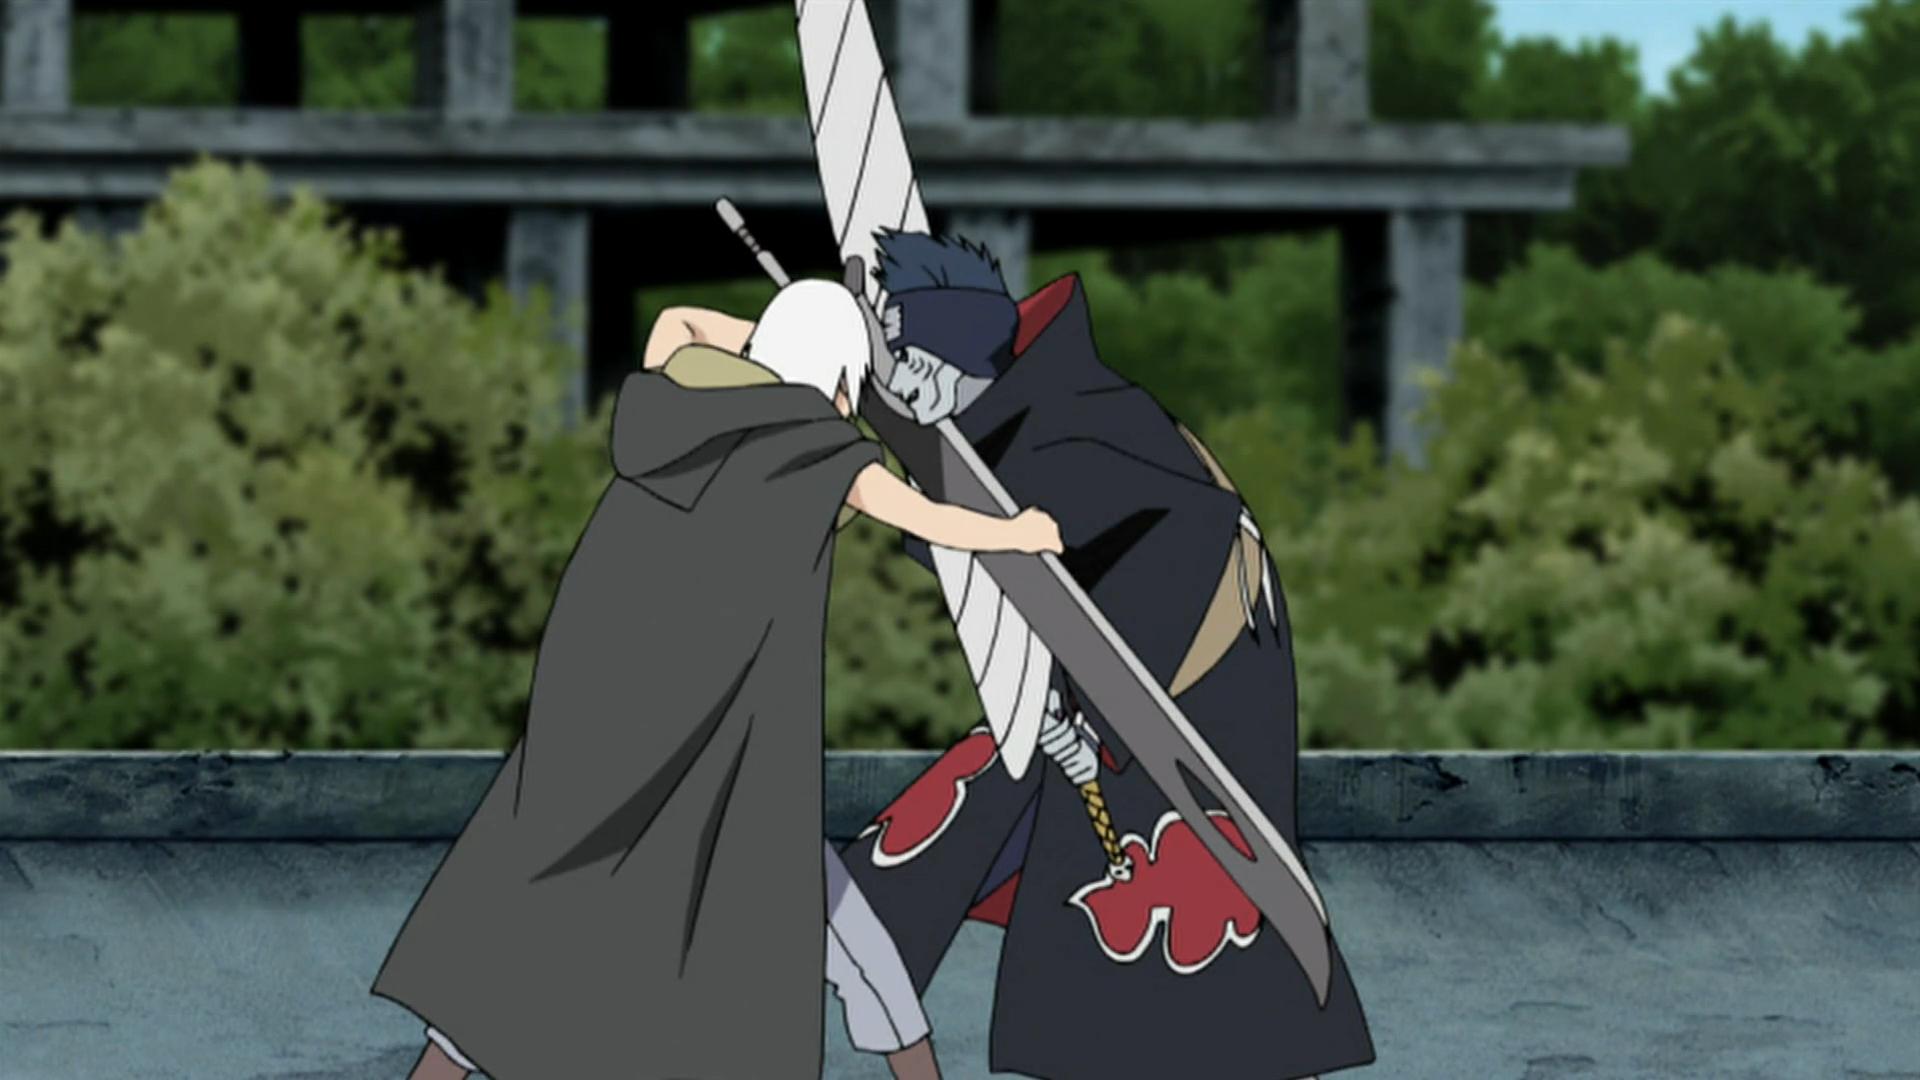 How strong would Kirigakure be if Kisame, Zabuza, Haku